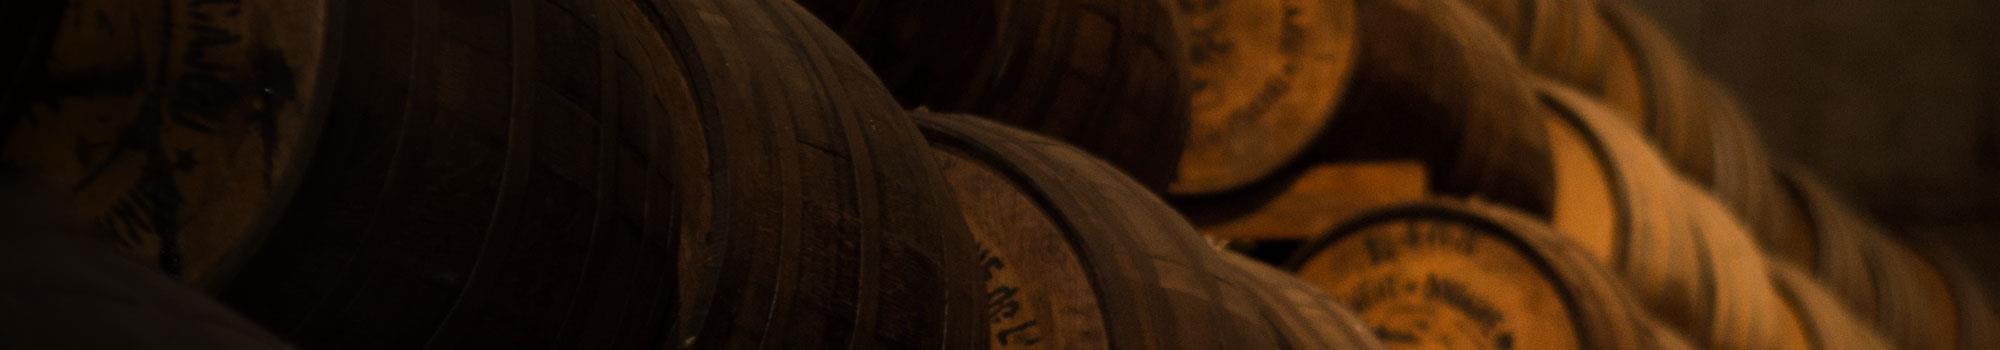 Speyside Single Malt Whisky